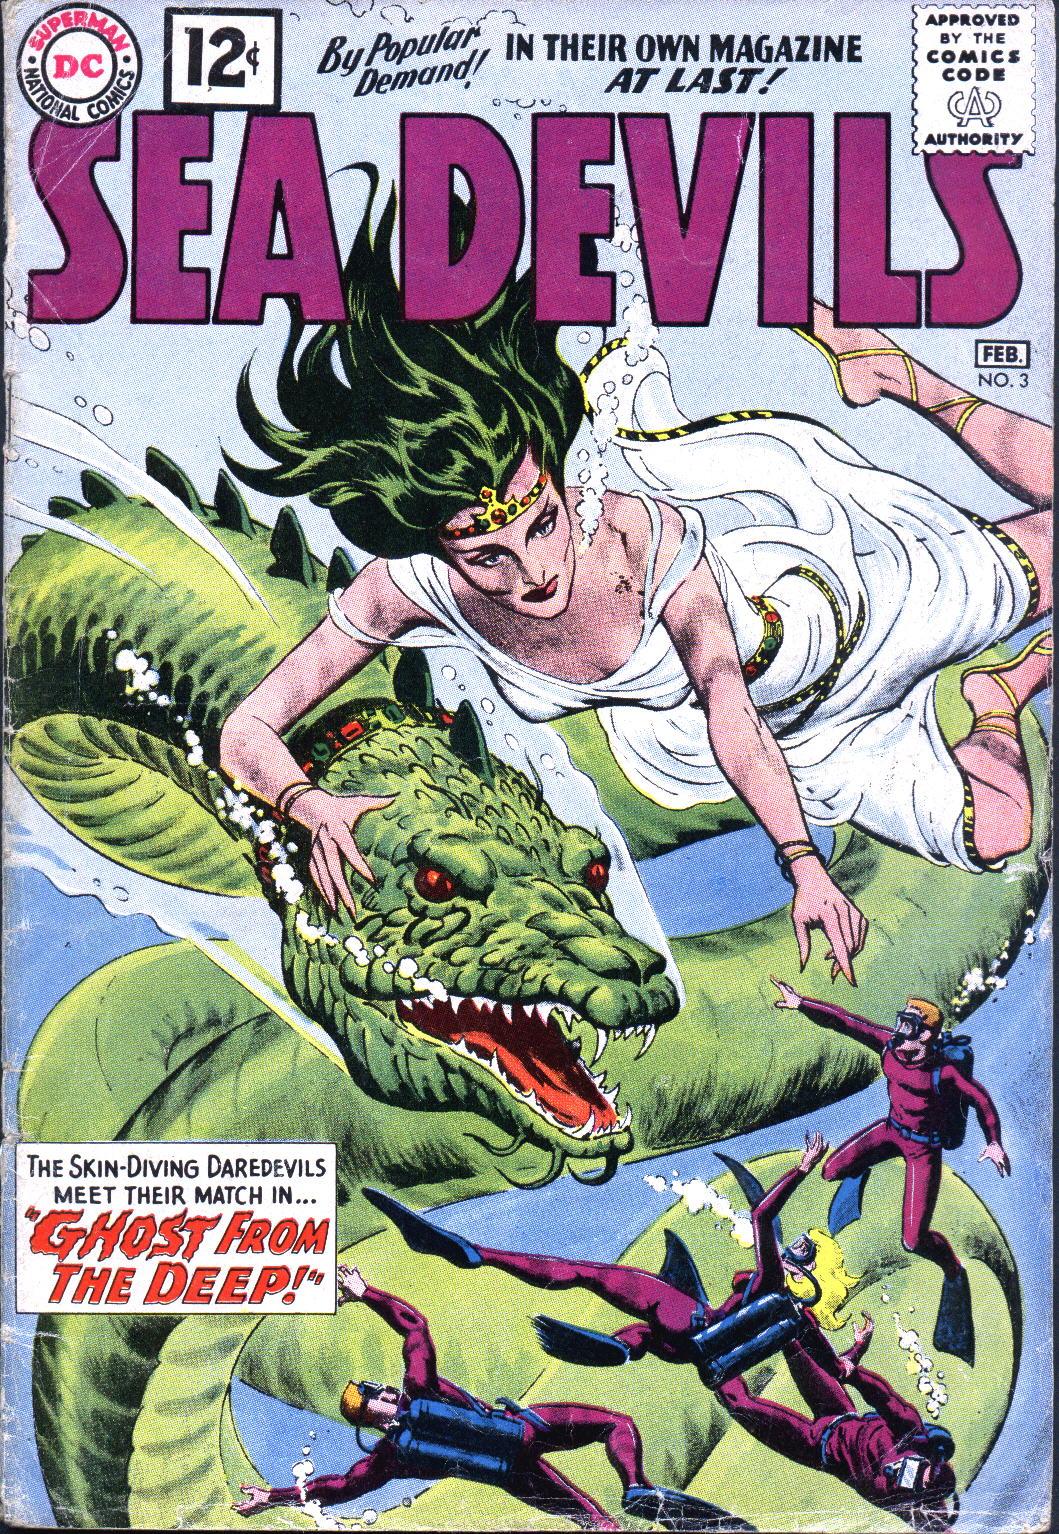 Read online Sea Devils comic -  Issue #3 - 2